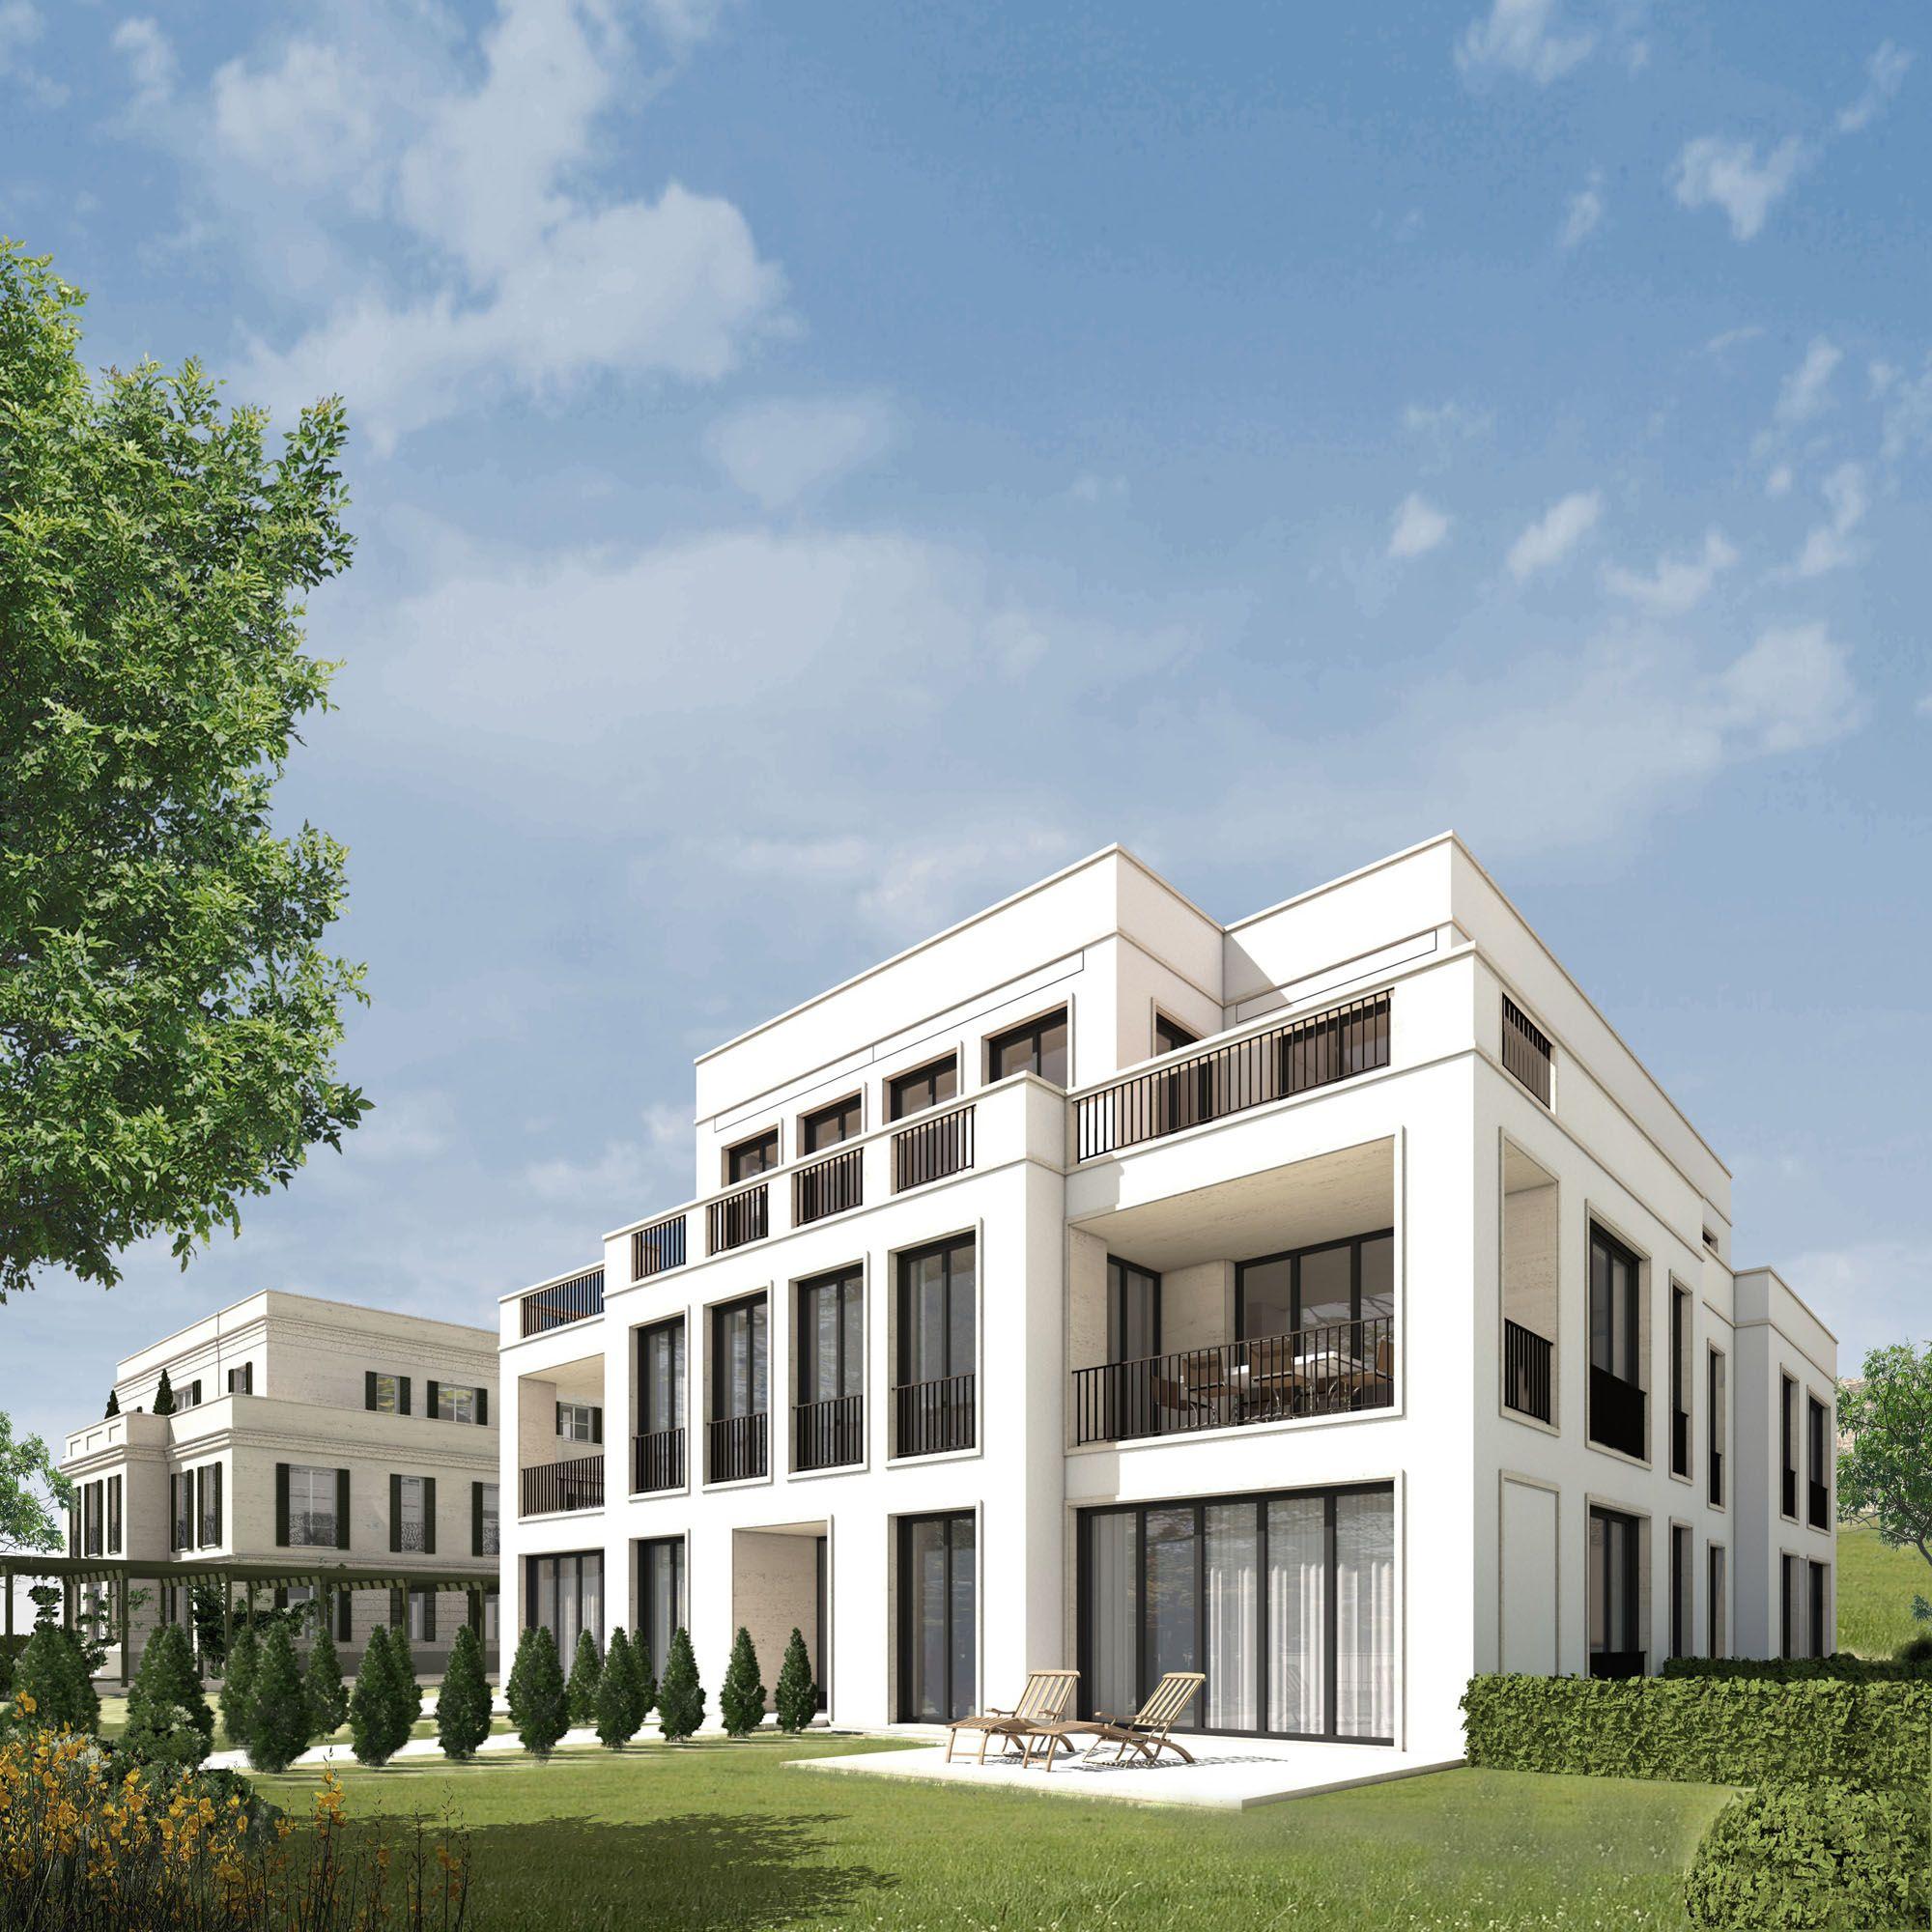 Villa rosensteinweg berlin architecture pinterest for Classic house facades